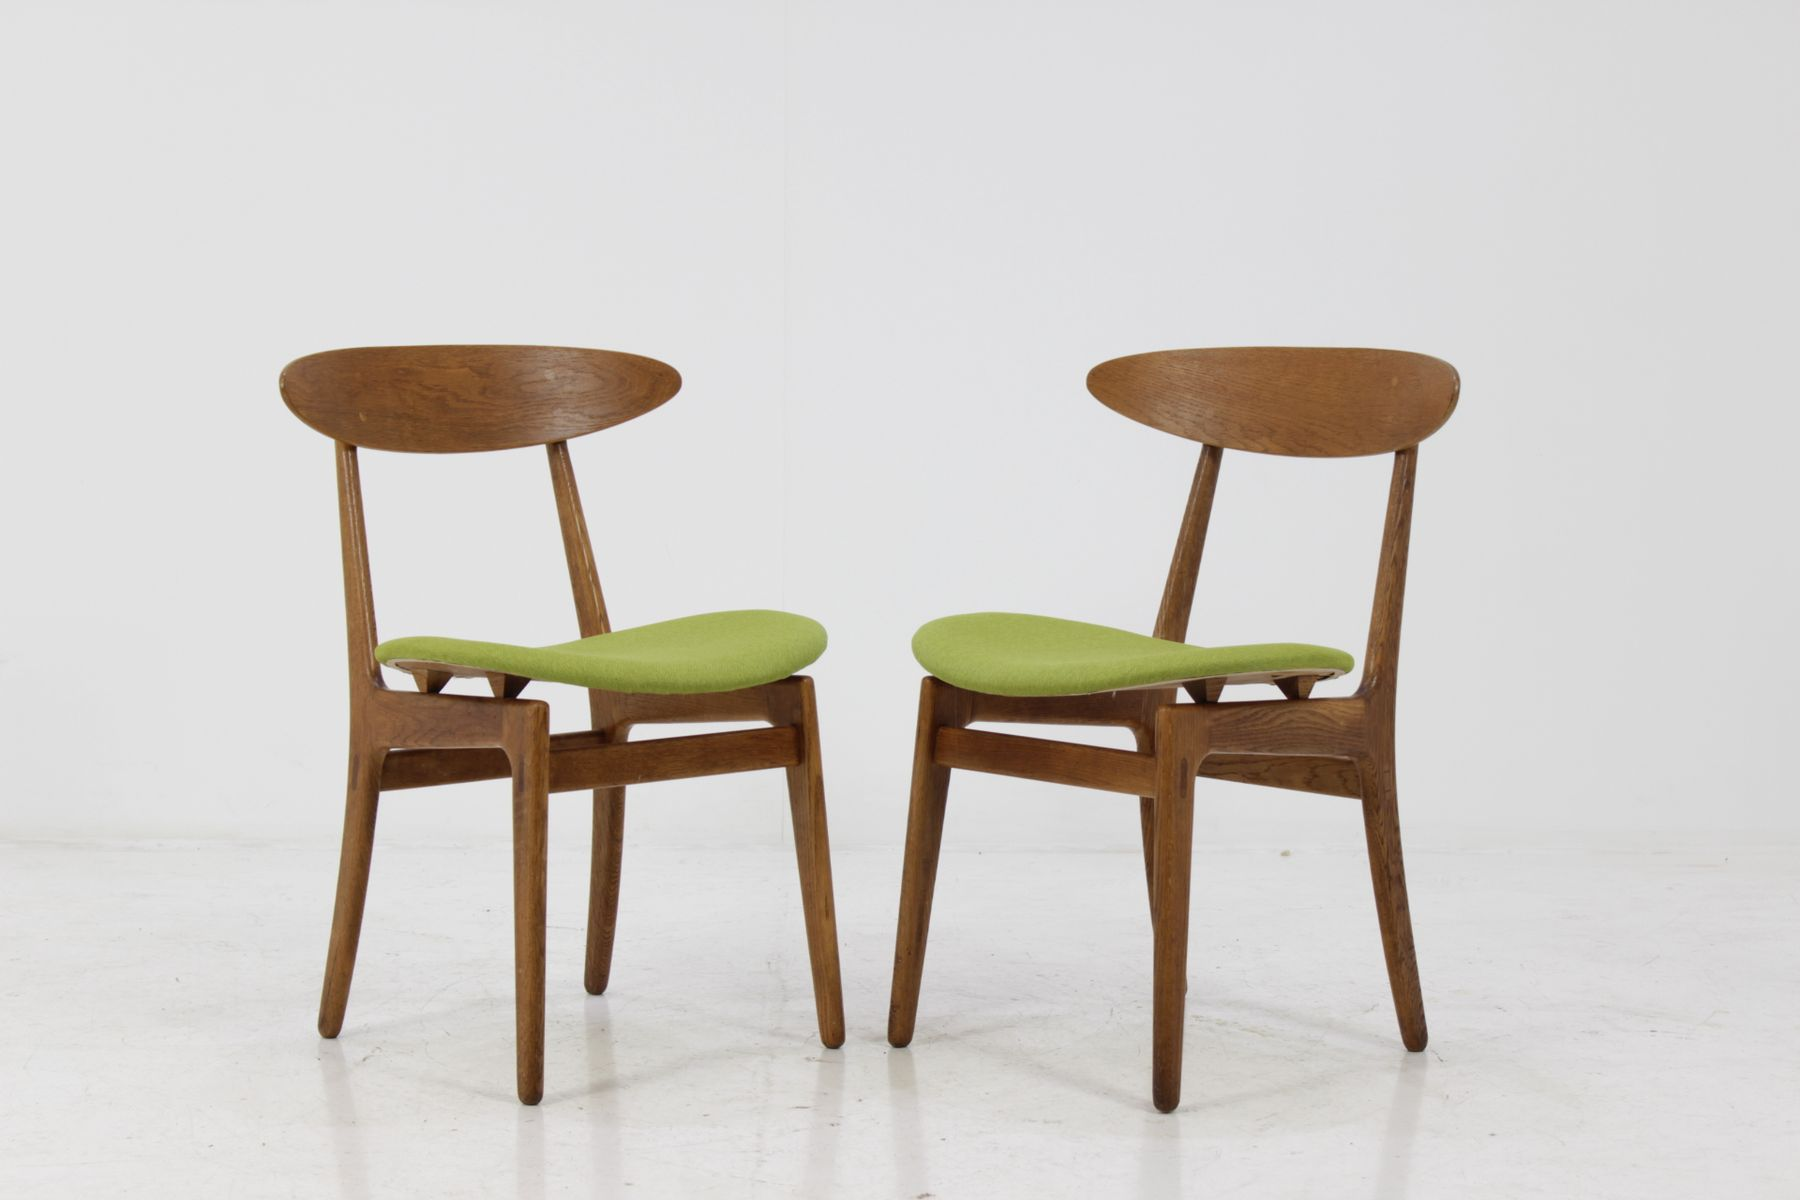 skandinavische eichenholz st hle 1960 2er set bei pamono kaufen. Black Bedroom Furniture Sets. Home Design Ideas